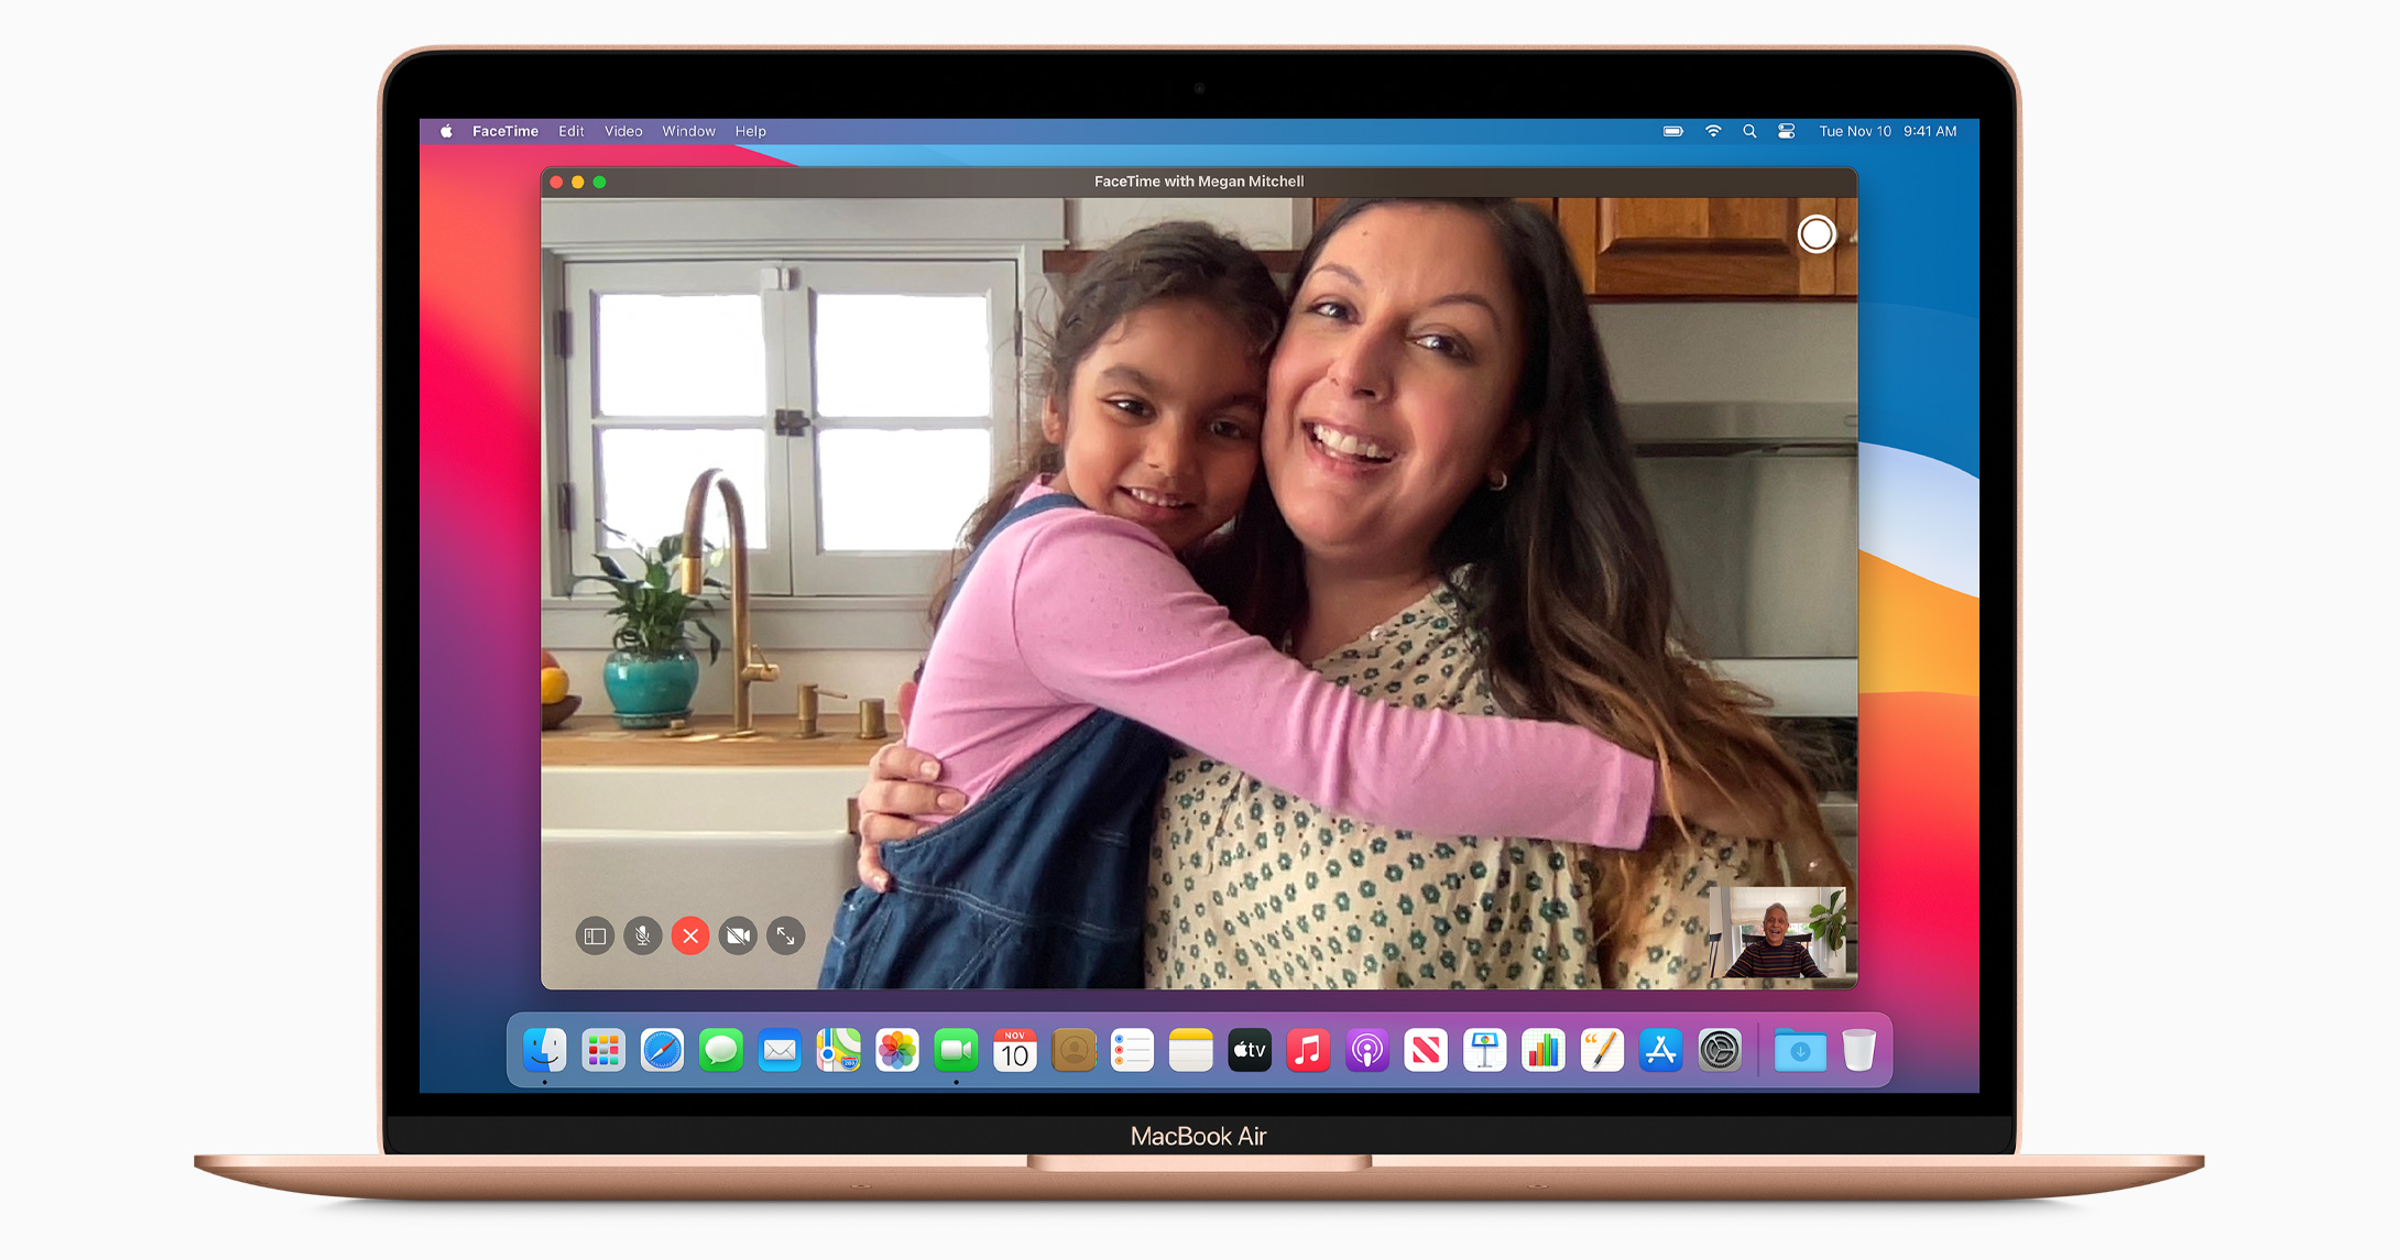 Gold MacBook Air M1